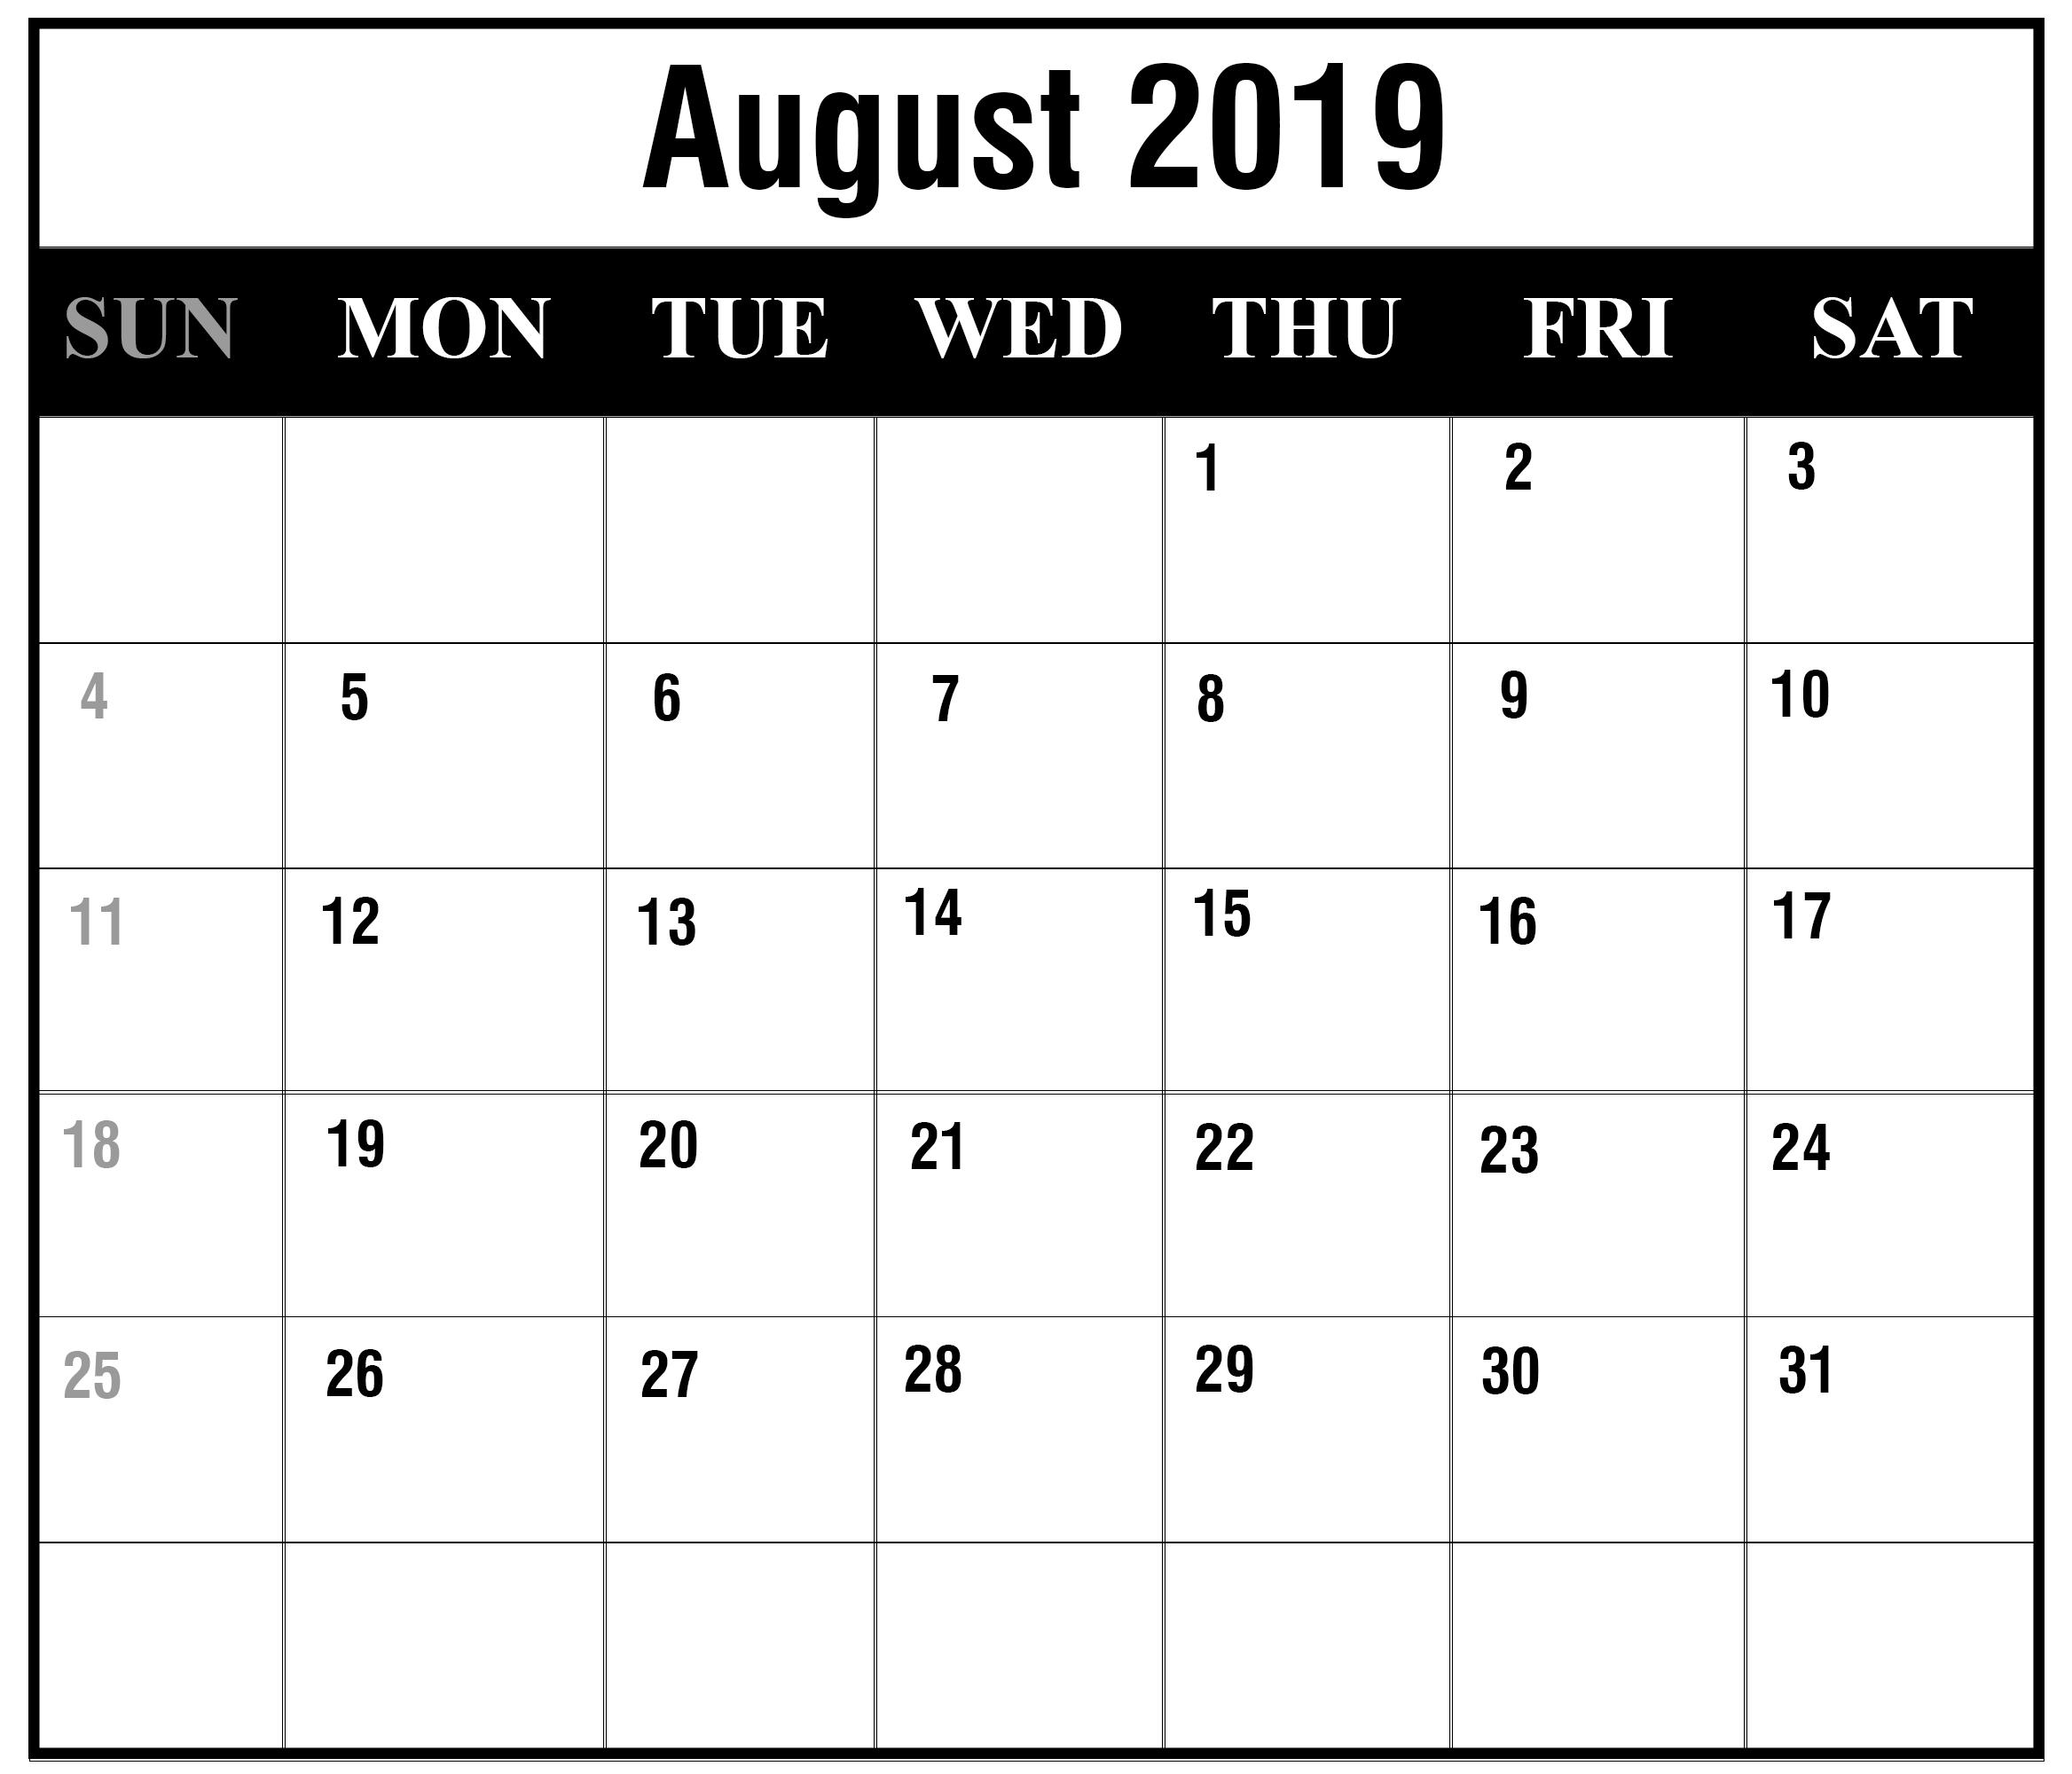 August Calendar 2019 Printable Pdf Word Template Free throughout Free Calendars 2021 Word Doc Printable August